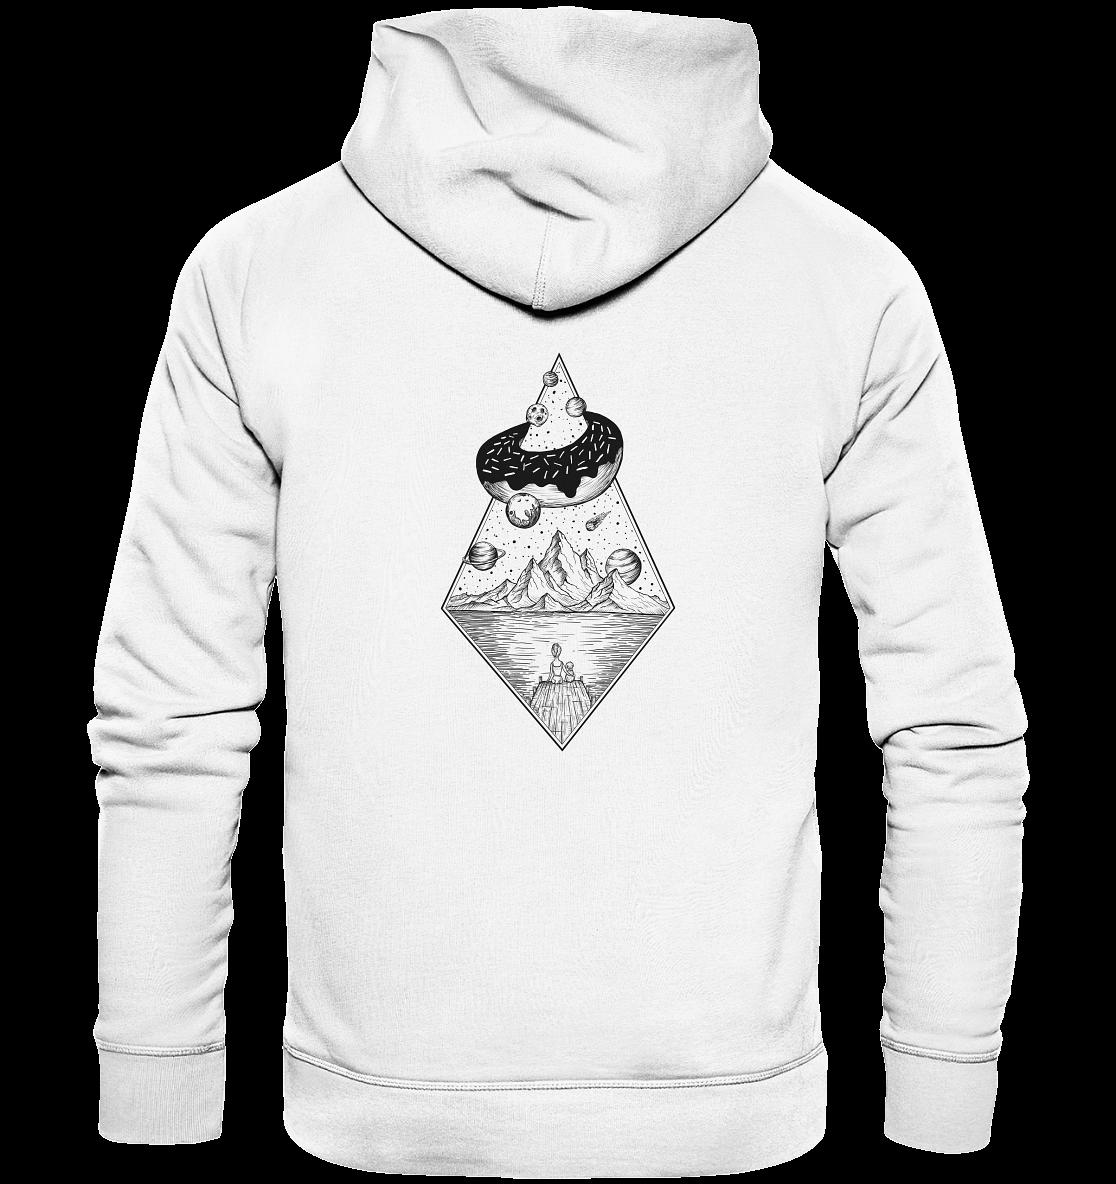 back-organic-fashion-hoodie-f8f8f8-1116x.png